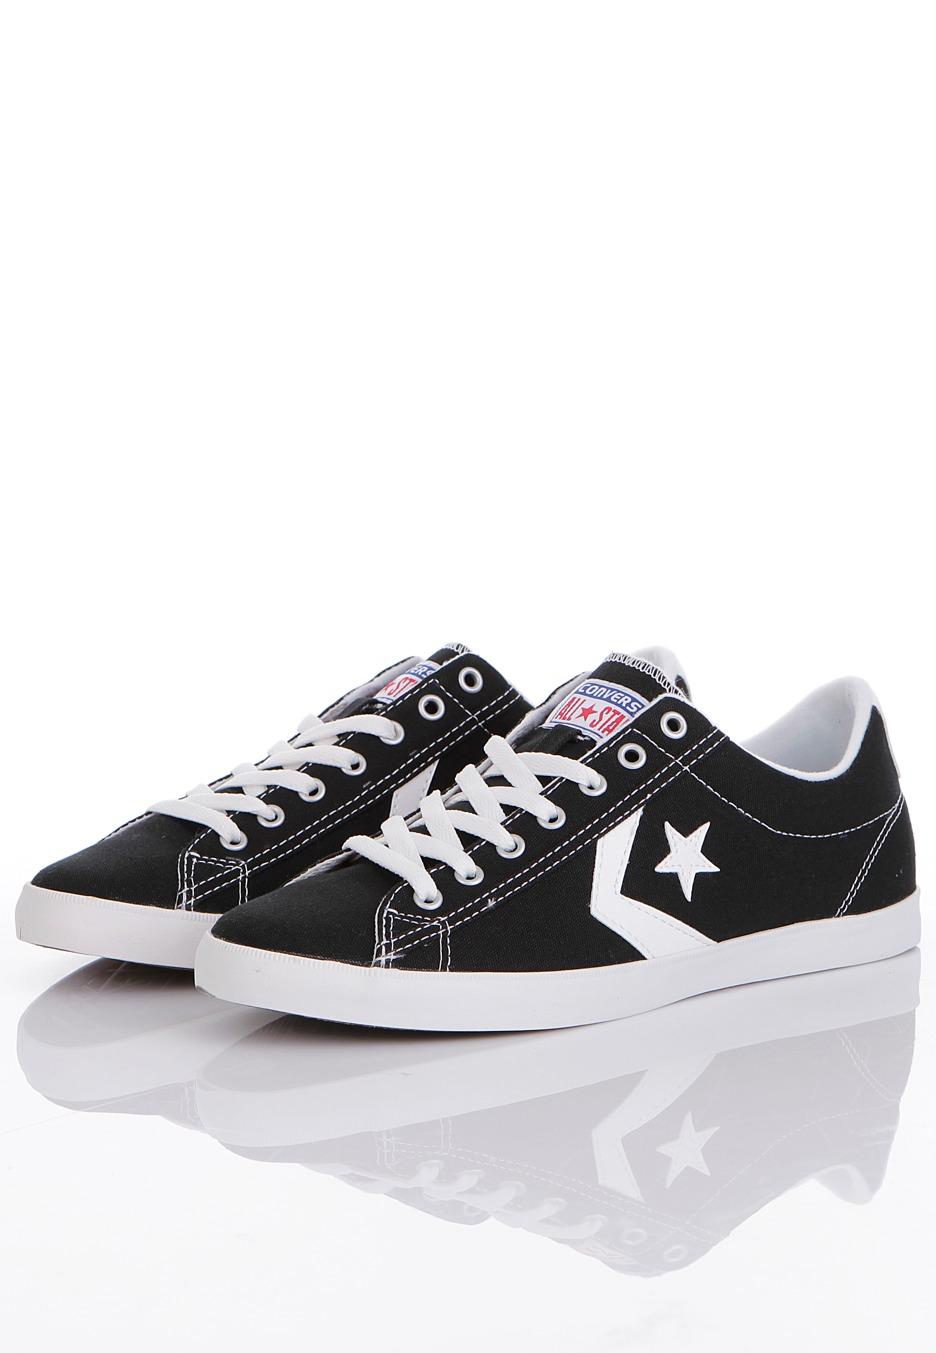 Converse Blackwhite Star Lp Ox Player Shoes Tex xnwHx1Trg